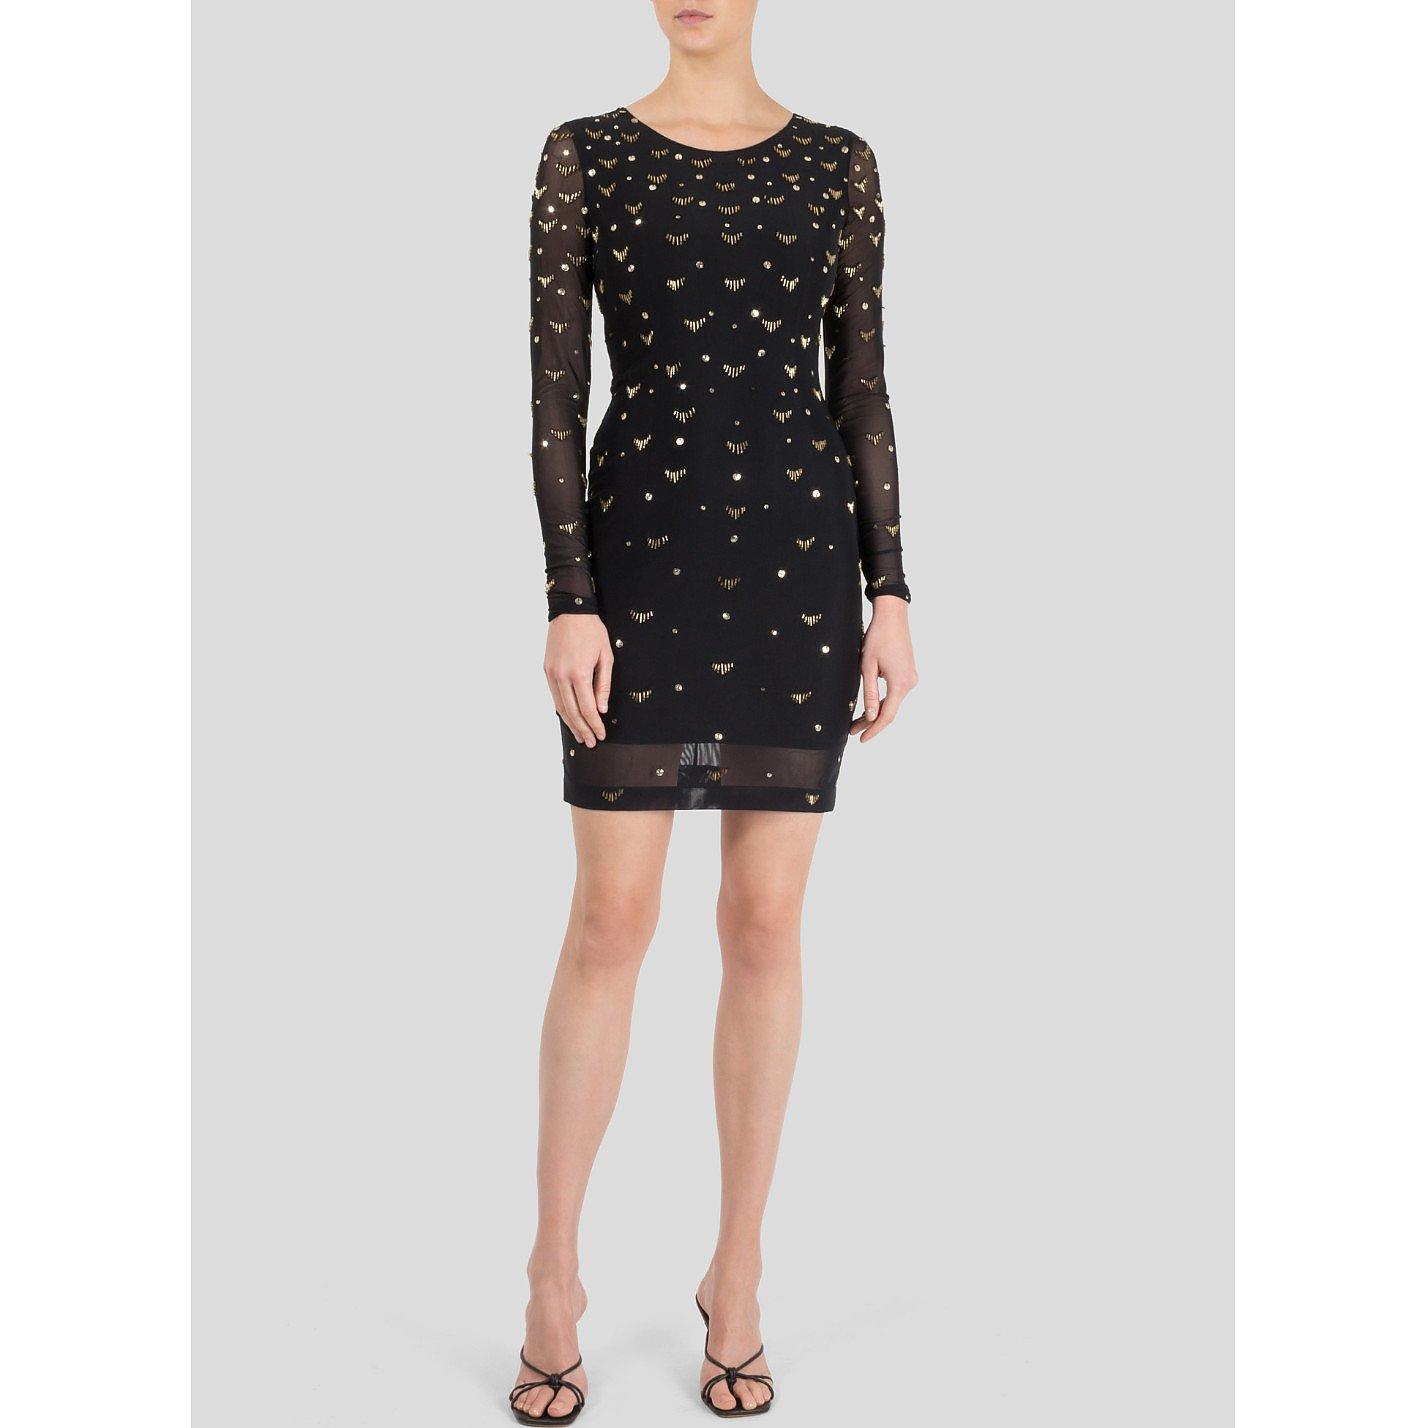 Temperley London Mesh Mini Dress With Sequin Embellishments